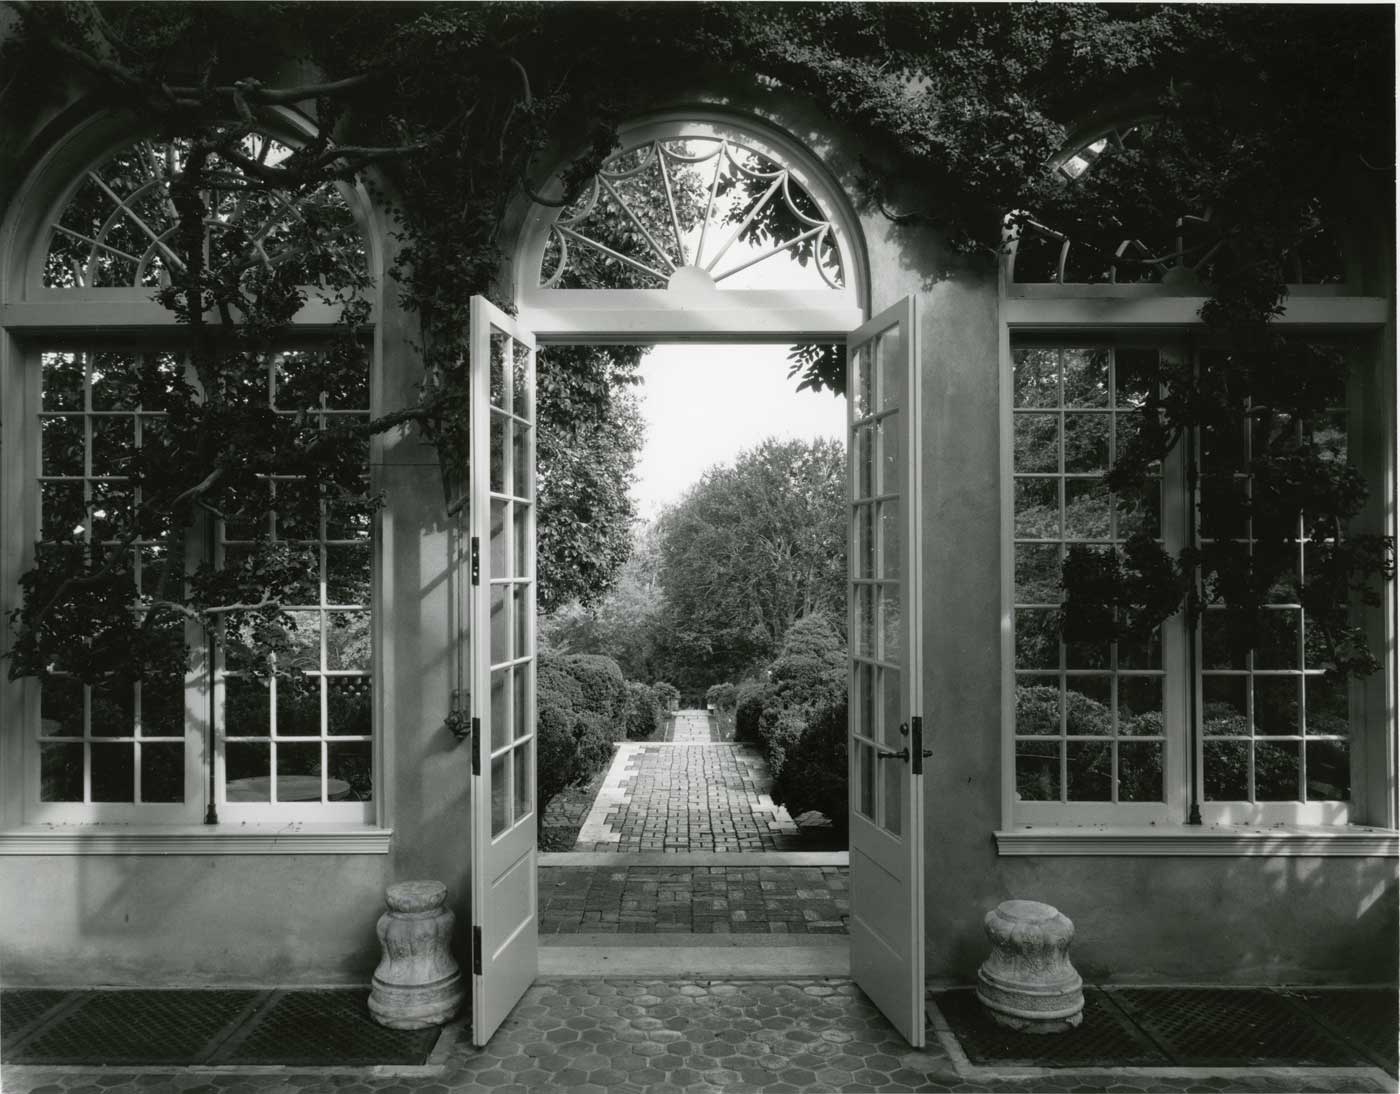 View from Orangery, Dumbarton Oaks. Washington, DC. Landscape by Beatrix Jones Farrand, photo by Alan Ward.